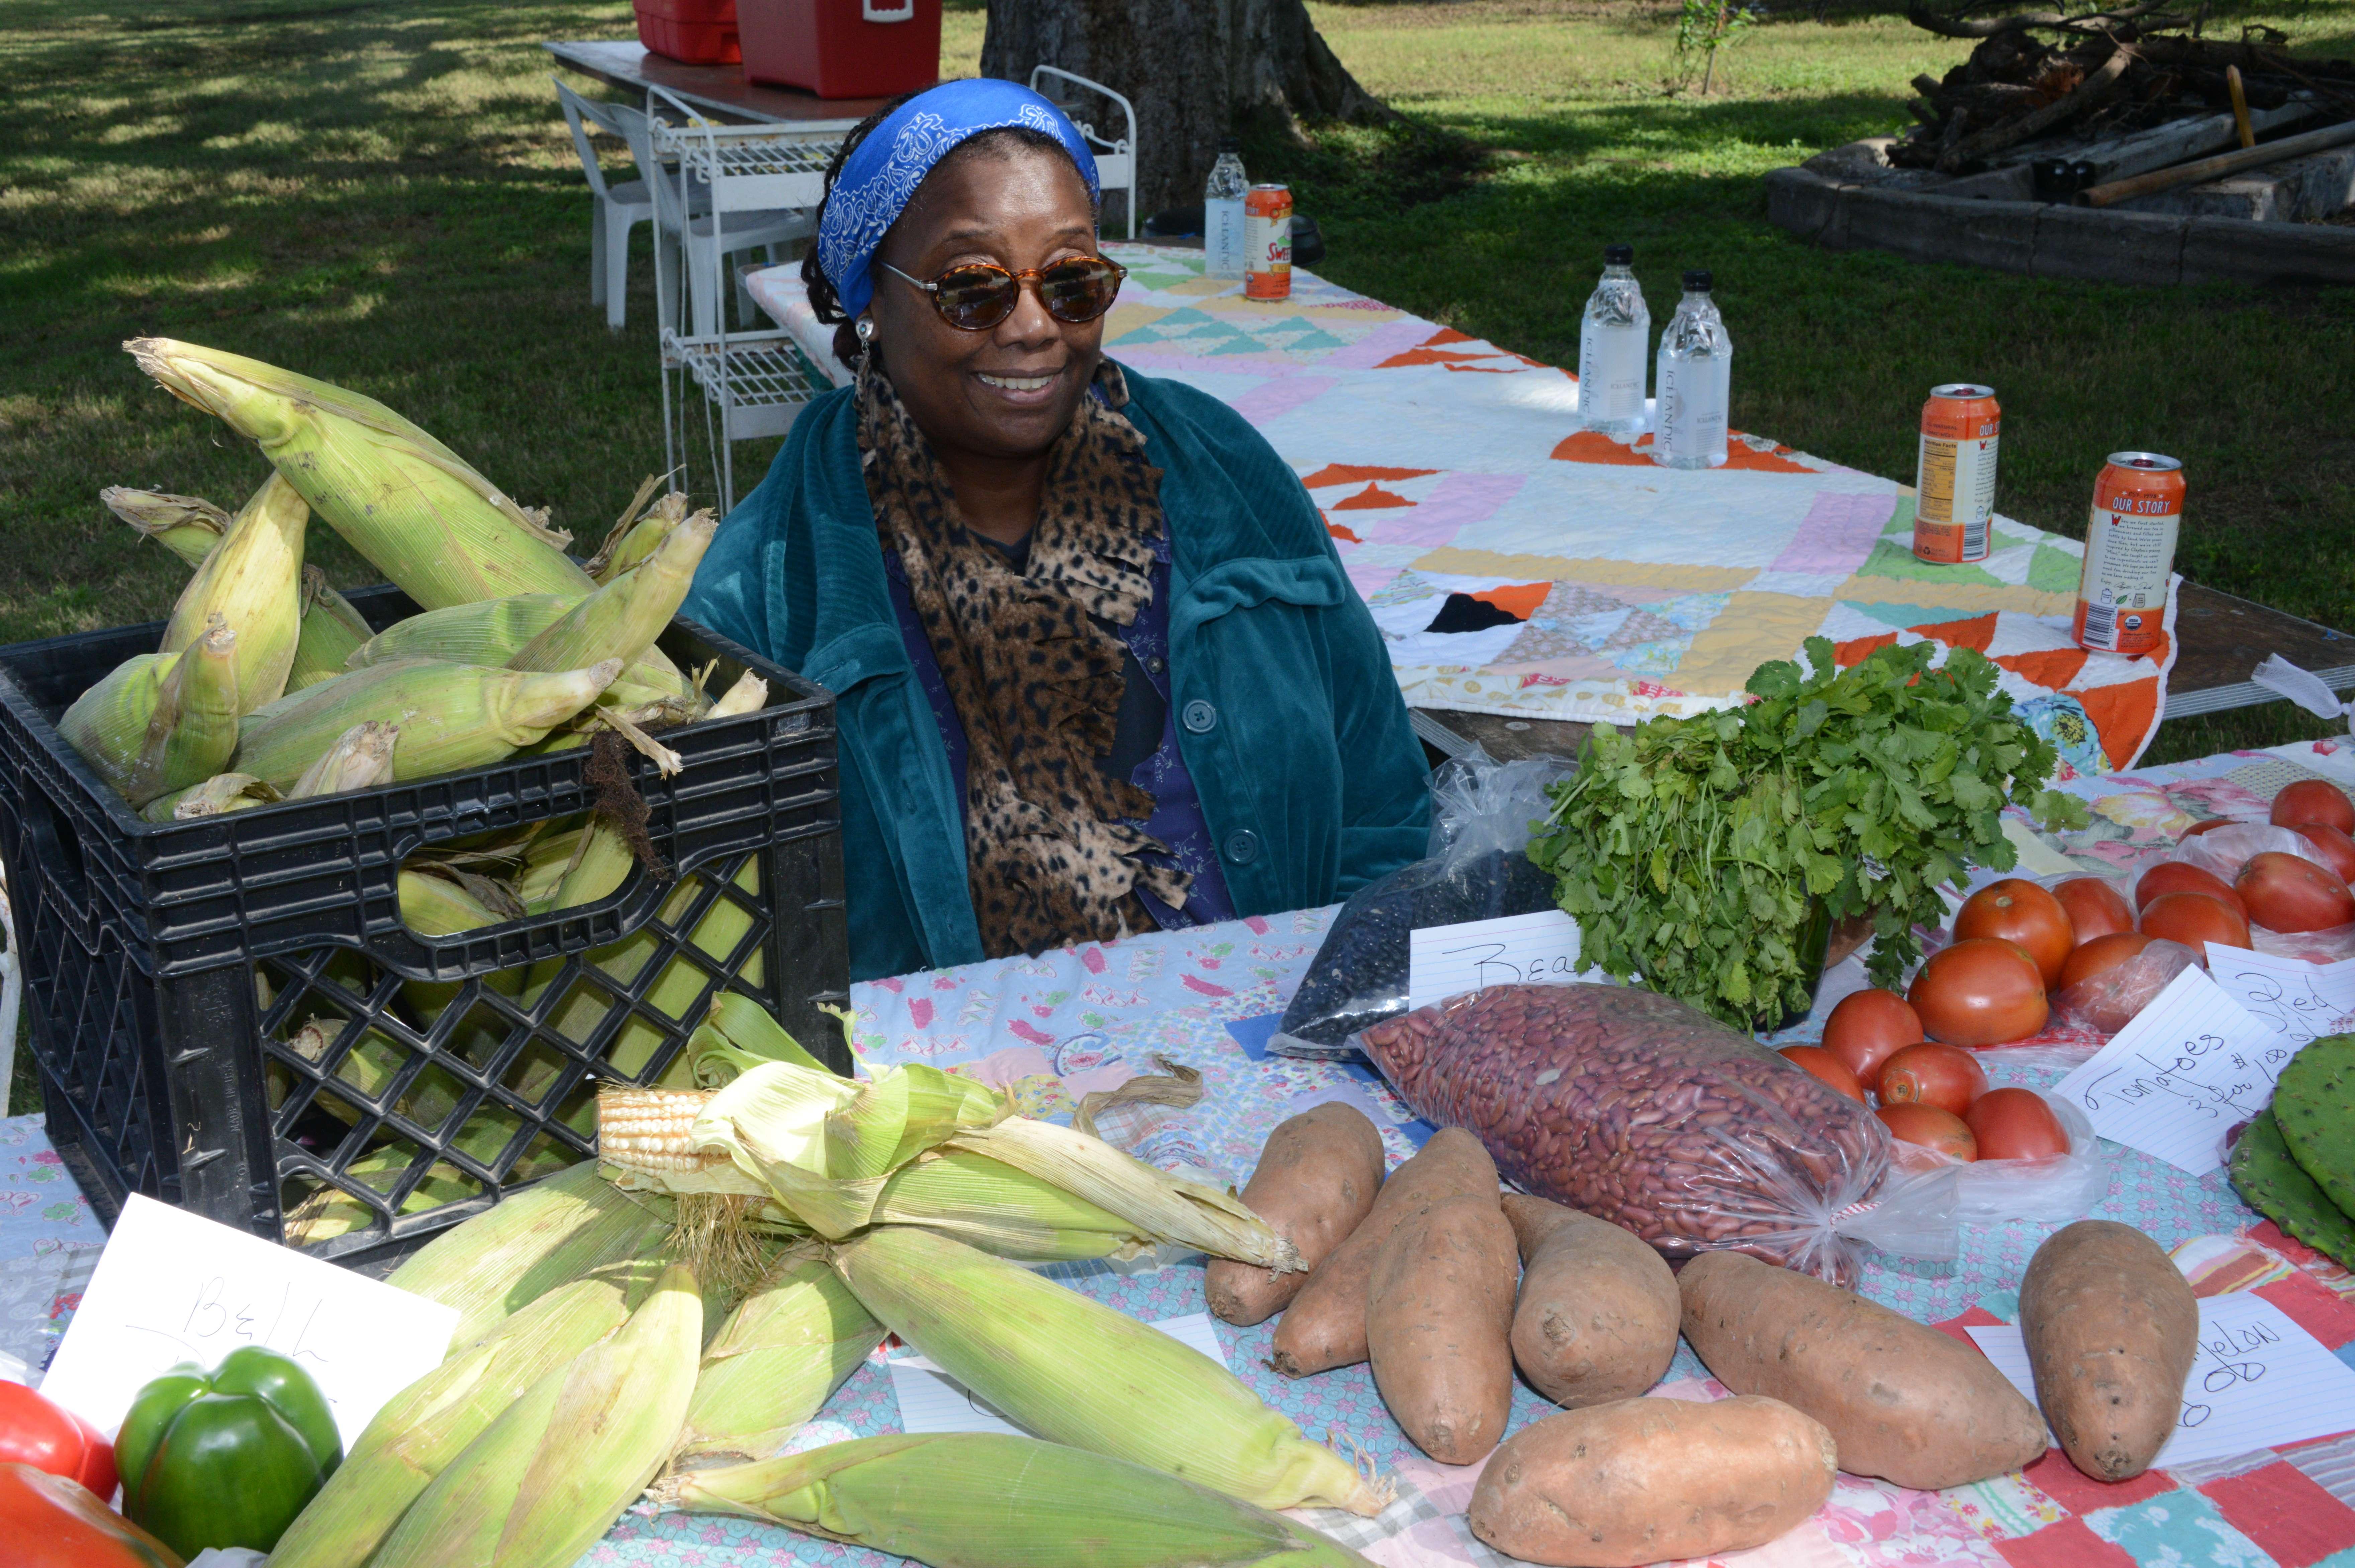 Farmer's Market Vendor